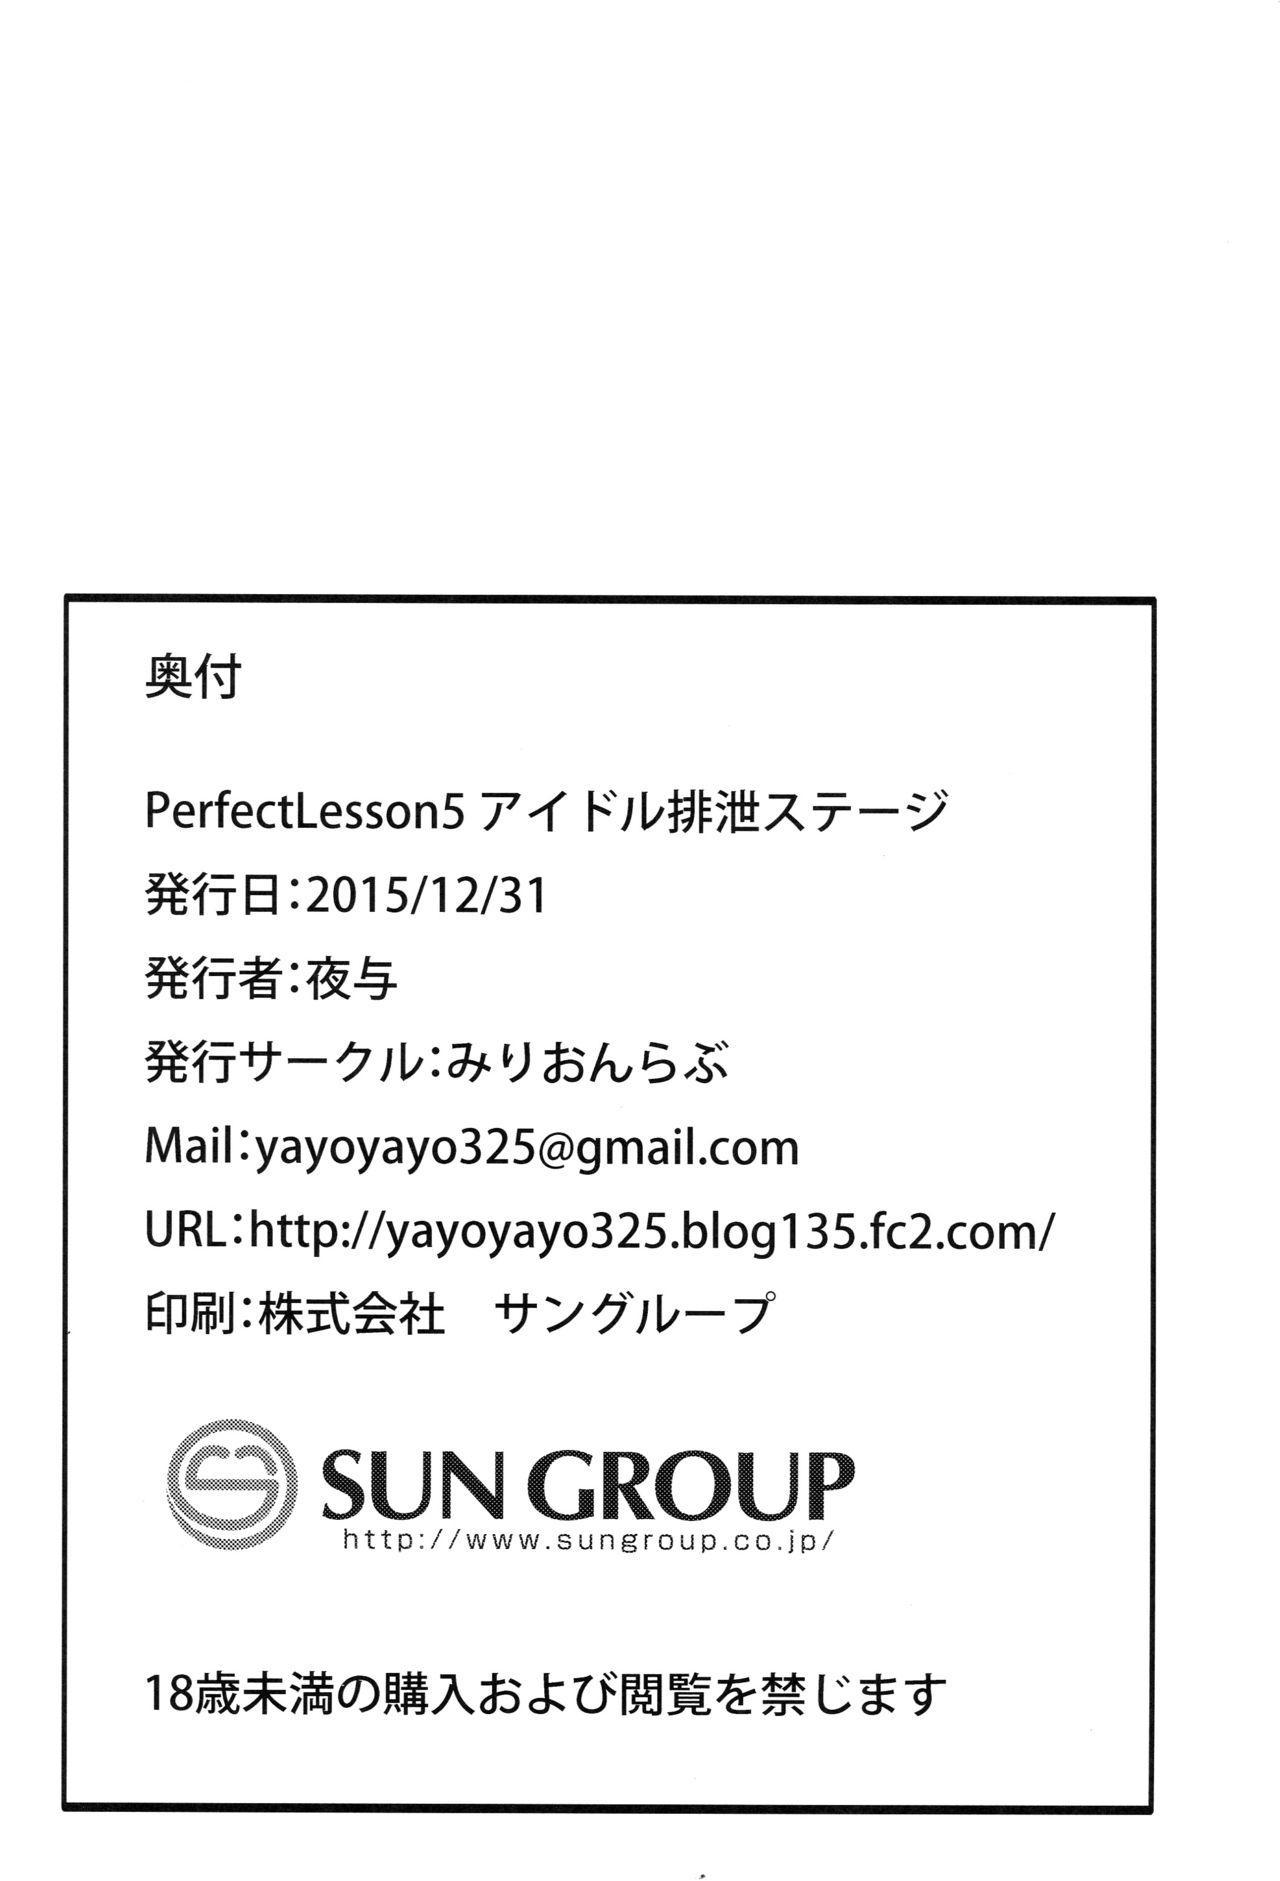 Perfect Lesson 5 Idol Haisetsu Stage 26